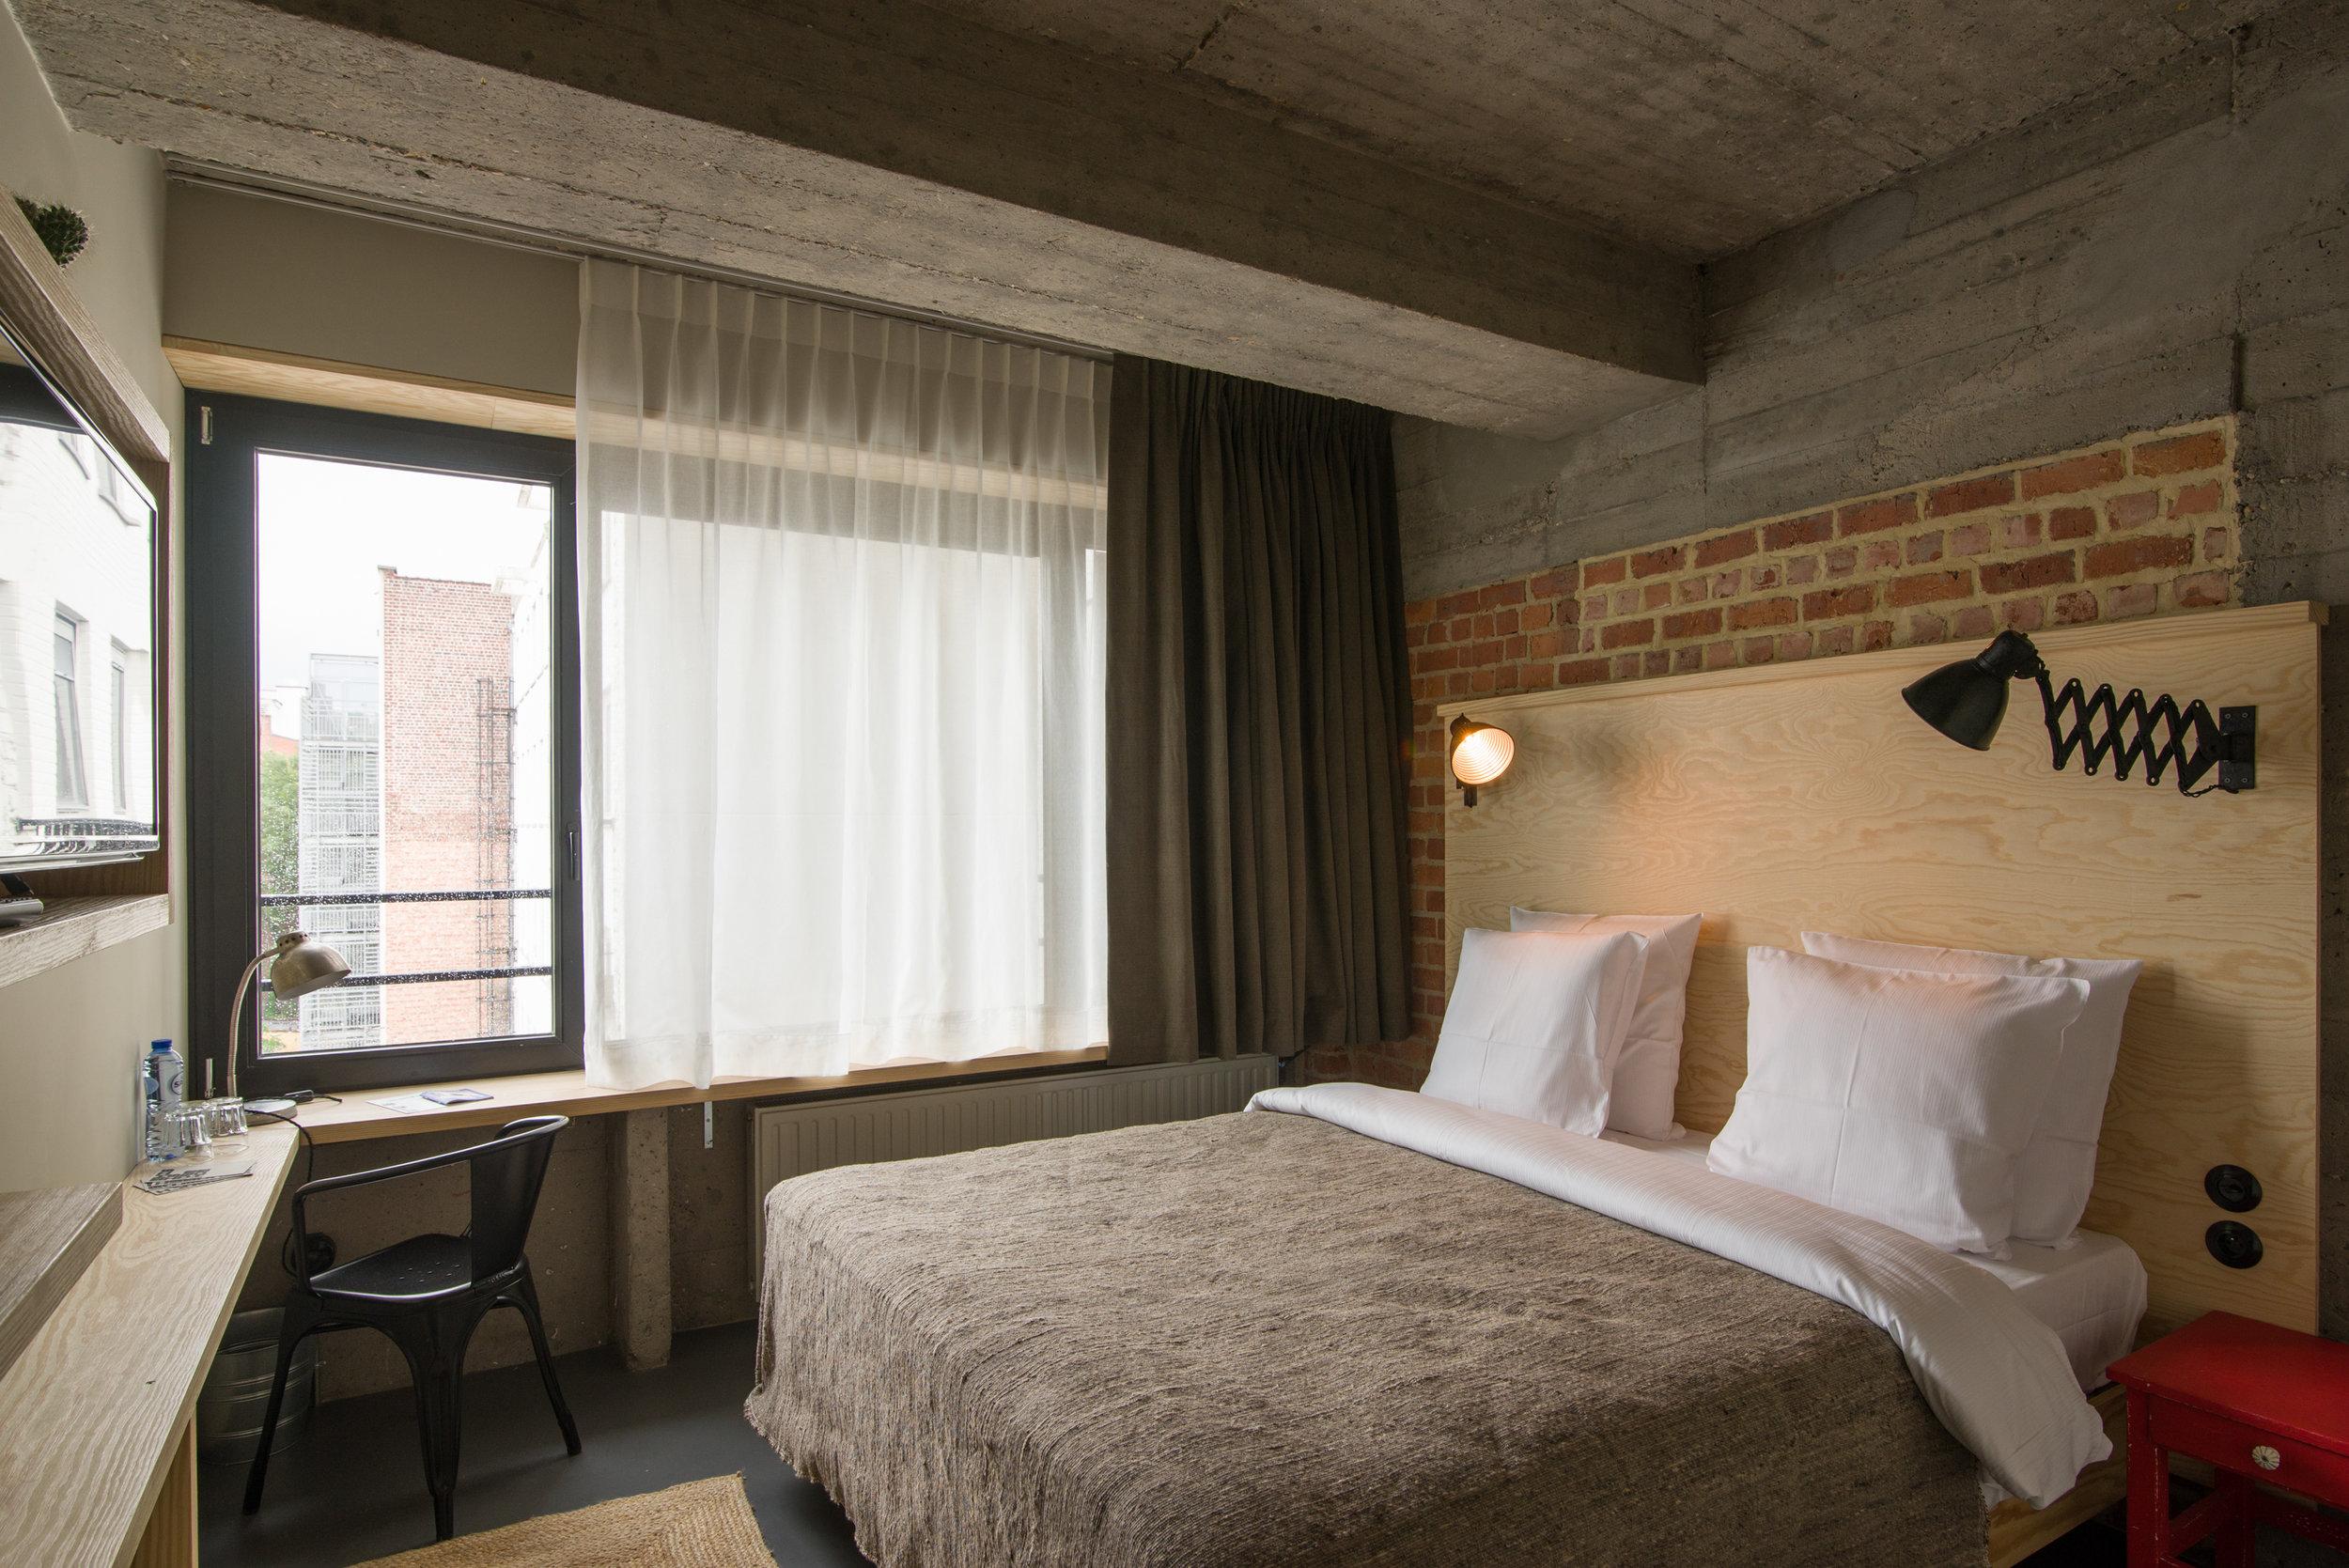 jam-hotel-brussels-rooms-extra-room-02.jpg